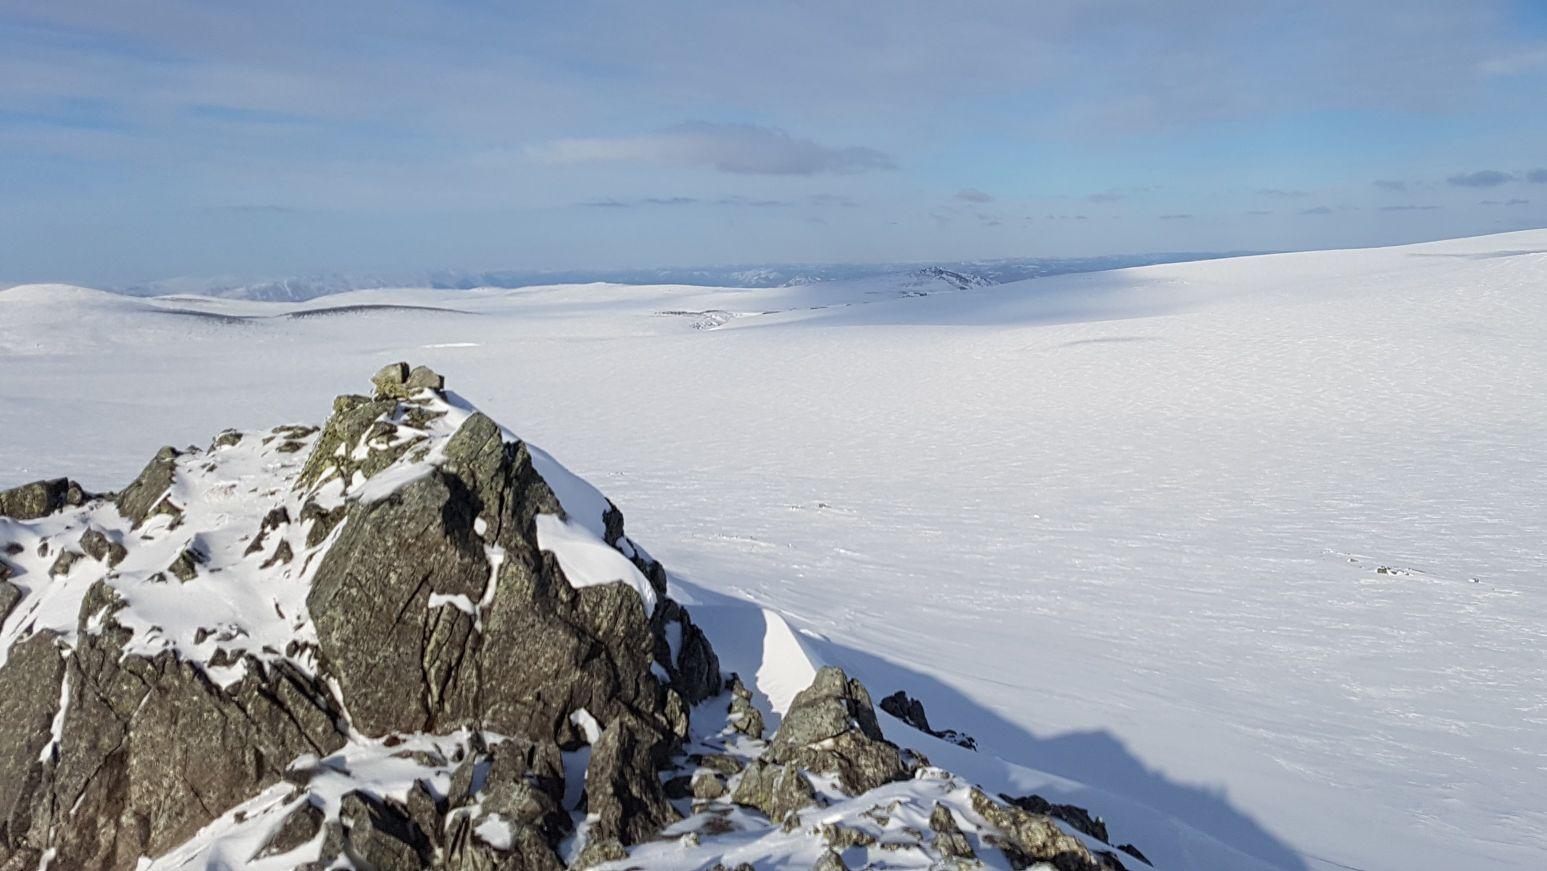 Blodminton Mountains Gallery Article Lifeproof Ipad Air Fre Case 1907 02 Glacier Bay Of Islands Western Newfoundland